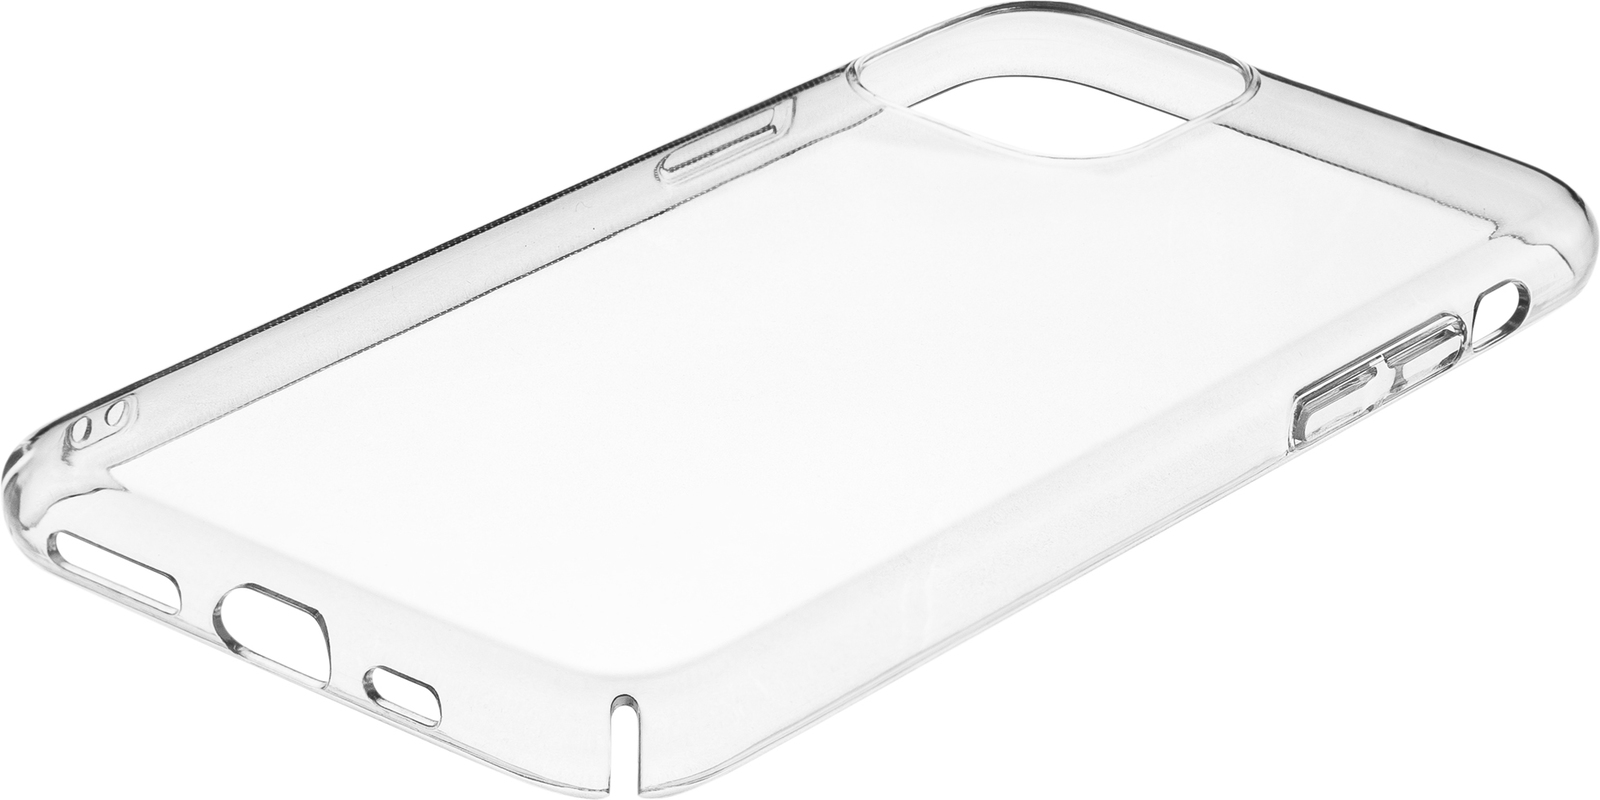 Sandberg Cover iPhone 11 Pro Hard Clear  406-58 - eet01